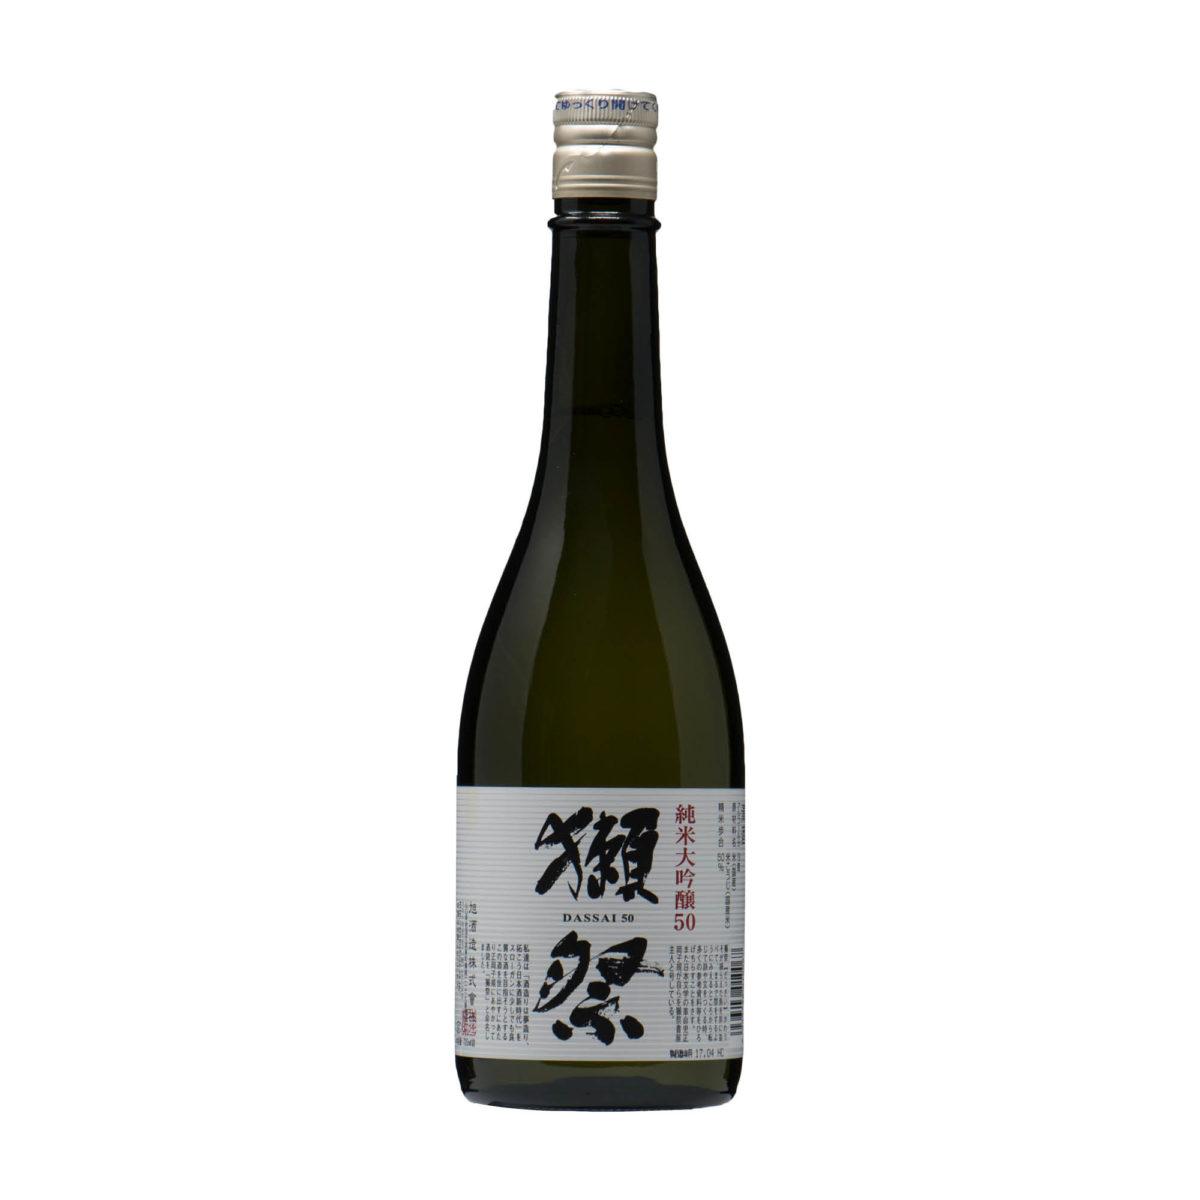 saké japonais Dassai50 junmai daiginjo